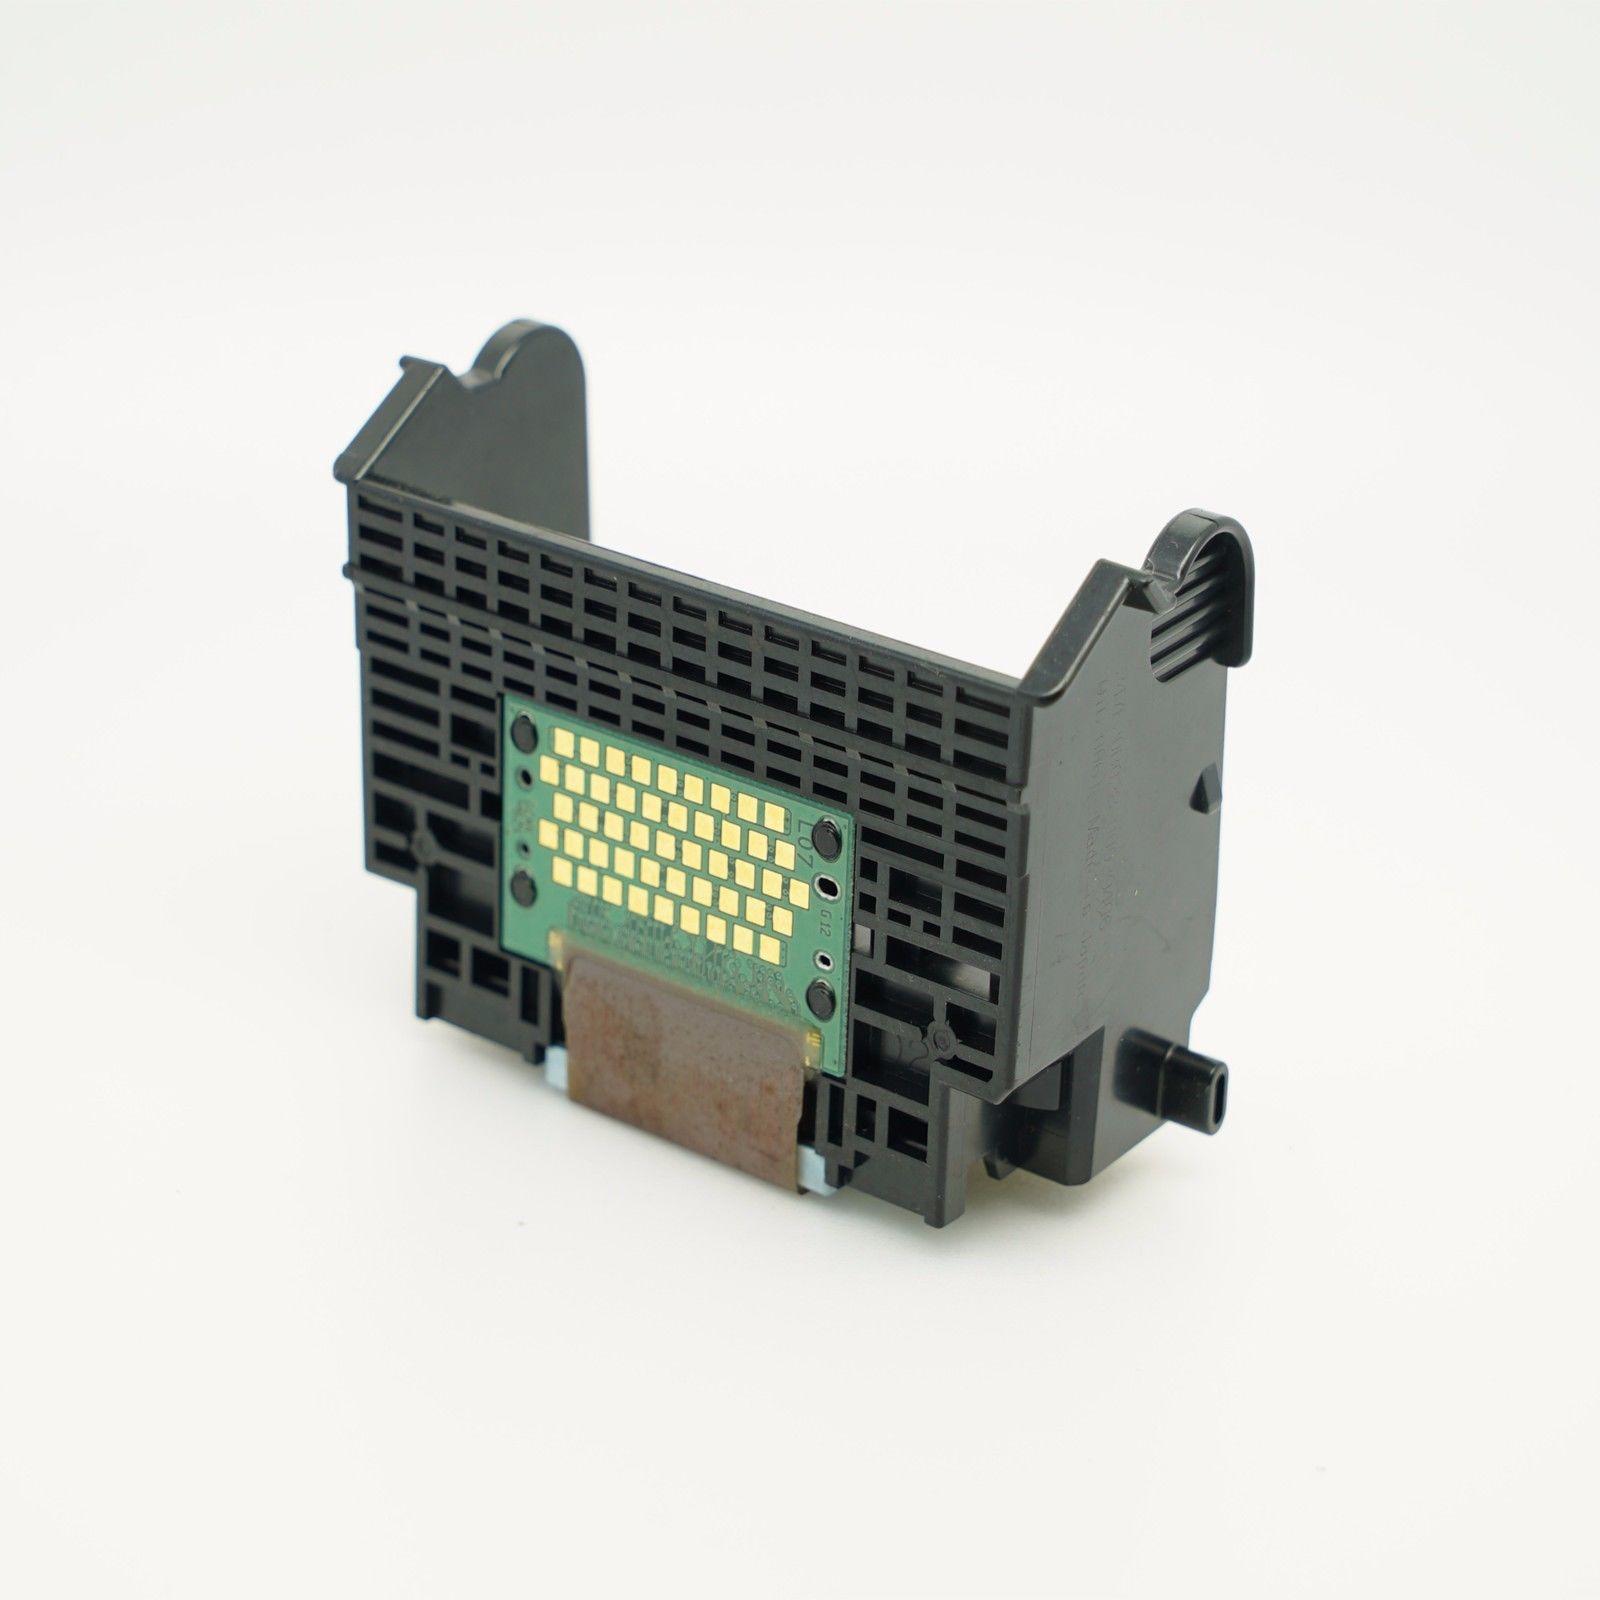 QY6-0061 Print Head for Canon IP4300 IP5200 IP5200R MP600 MP600R MP800 MP830 Printhead